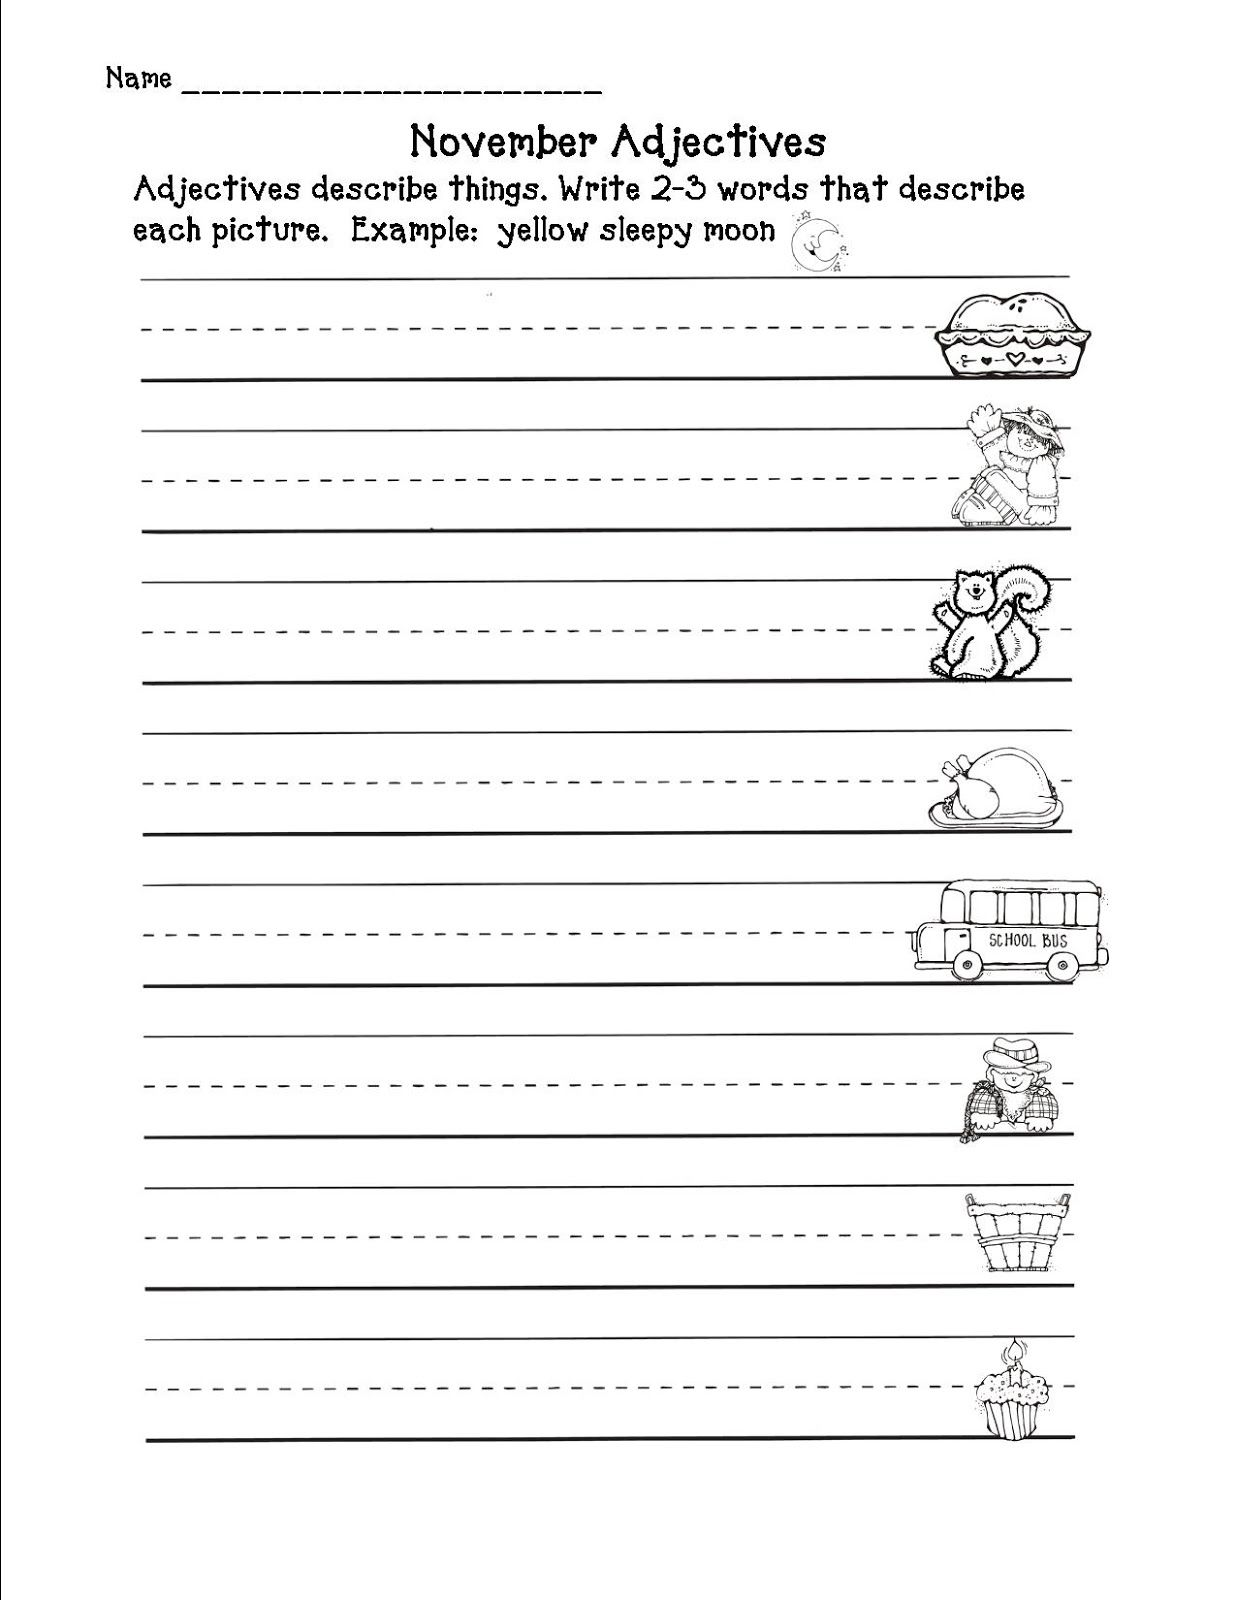 November Adjectives Worksheet Second Grade Freebies